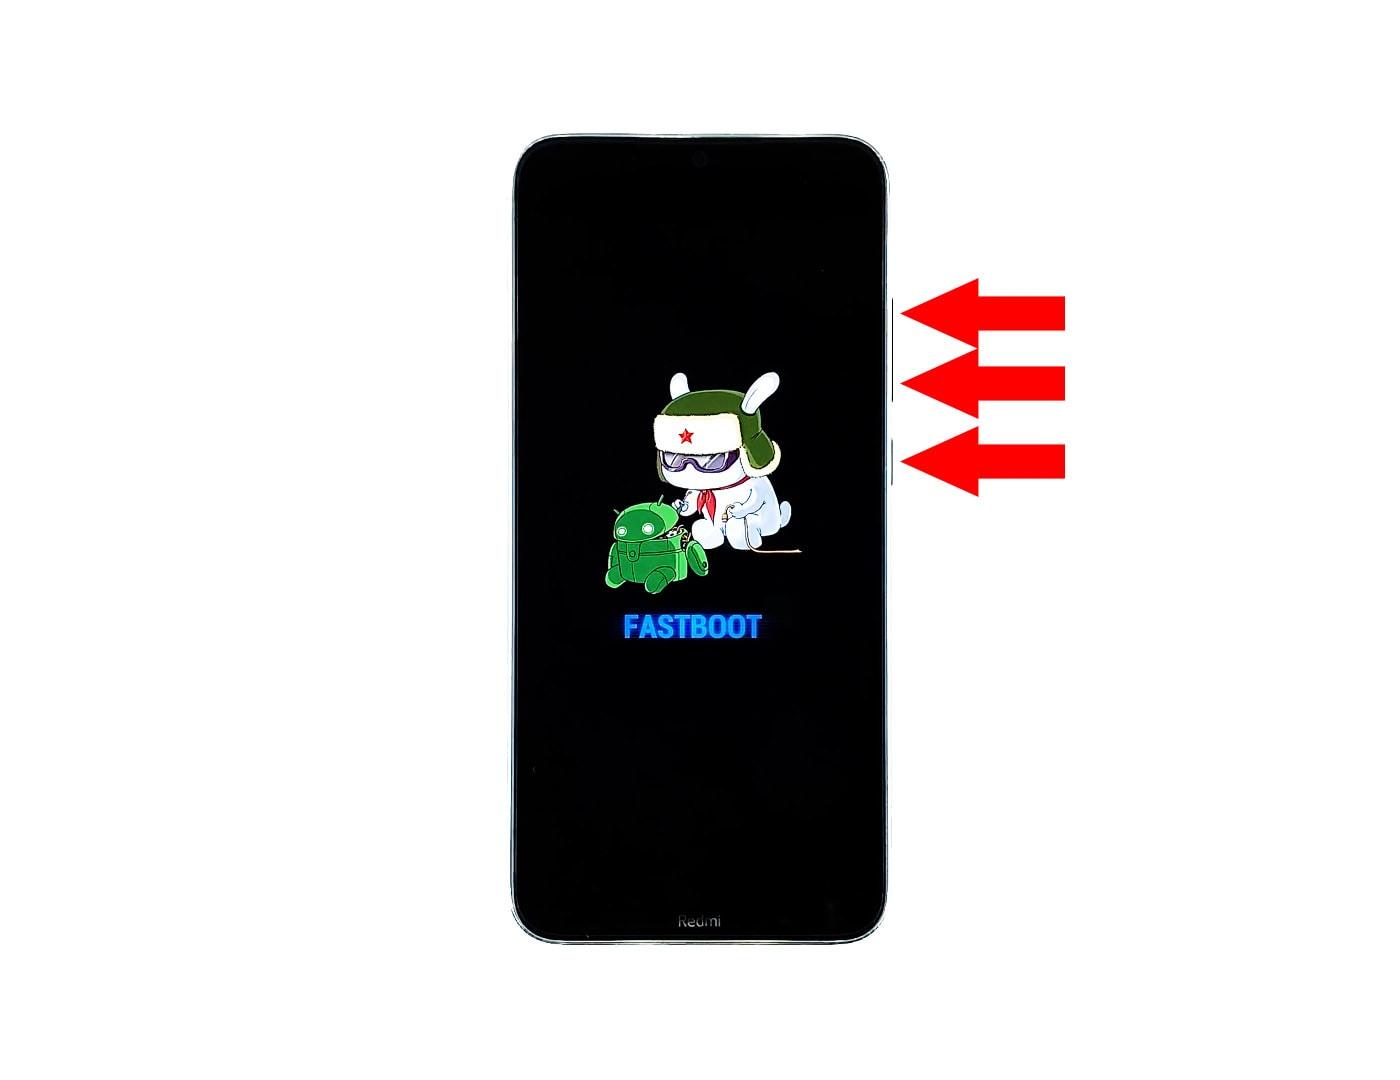 redmi note 8 stuck on fastboot screen force restart